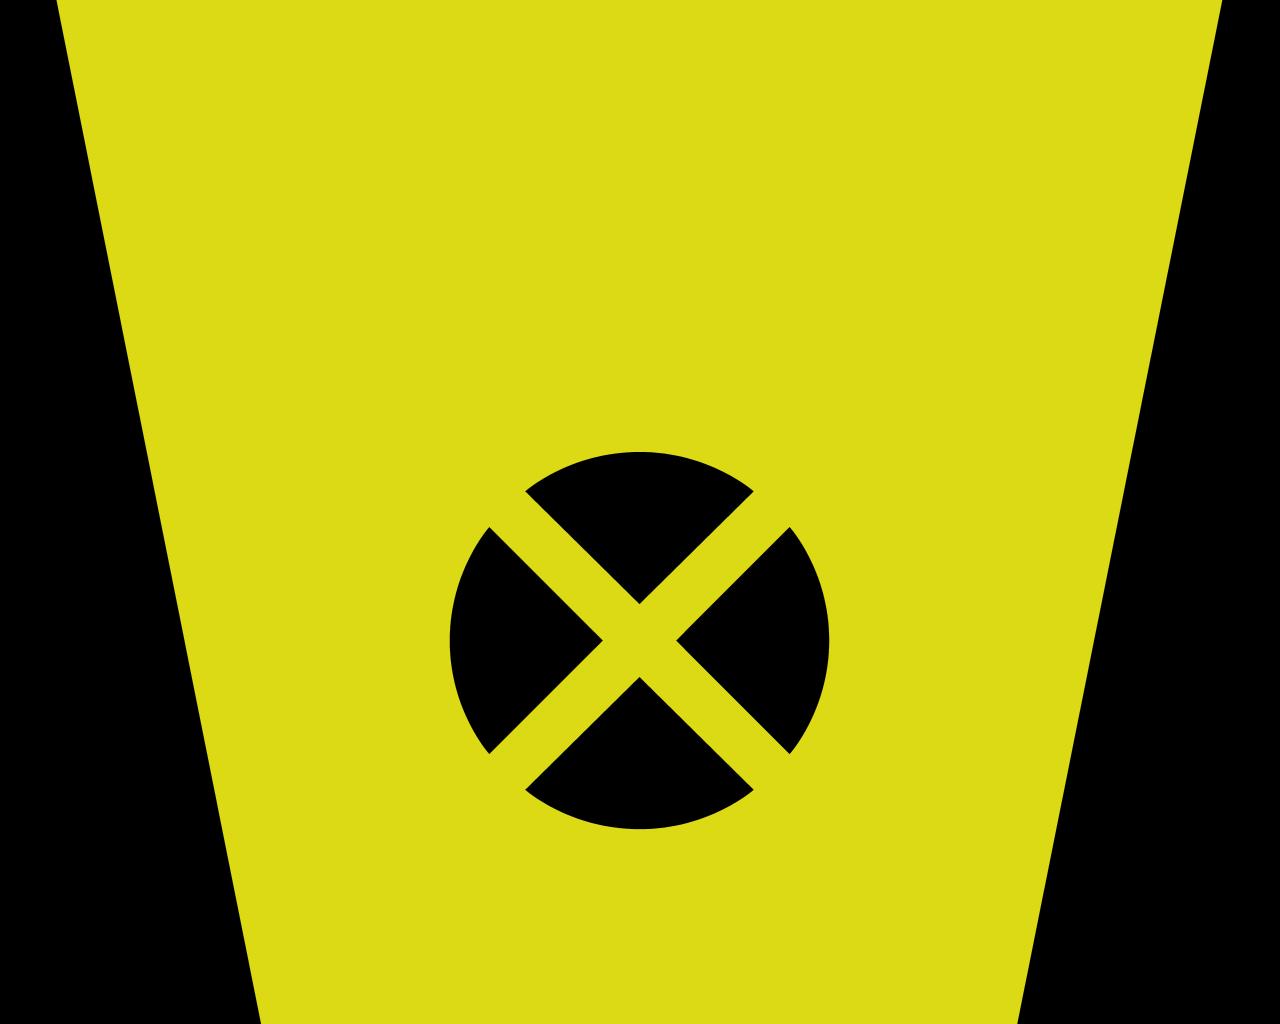 X Men Logo Wallpaper Hd Dip Logo Wallpaper Hd Men Logo Wallpaper